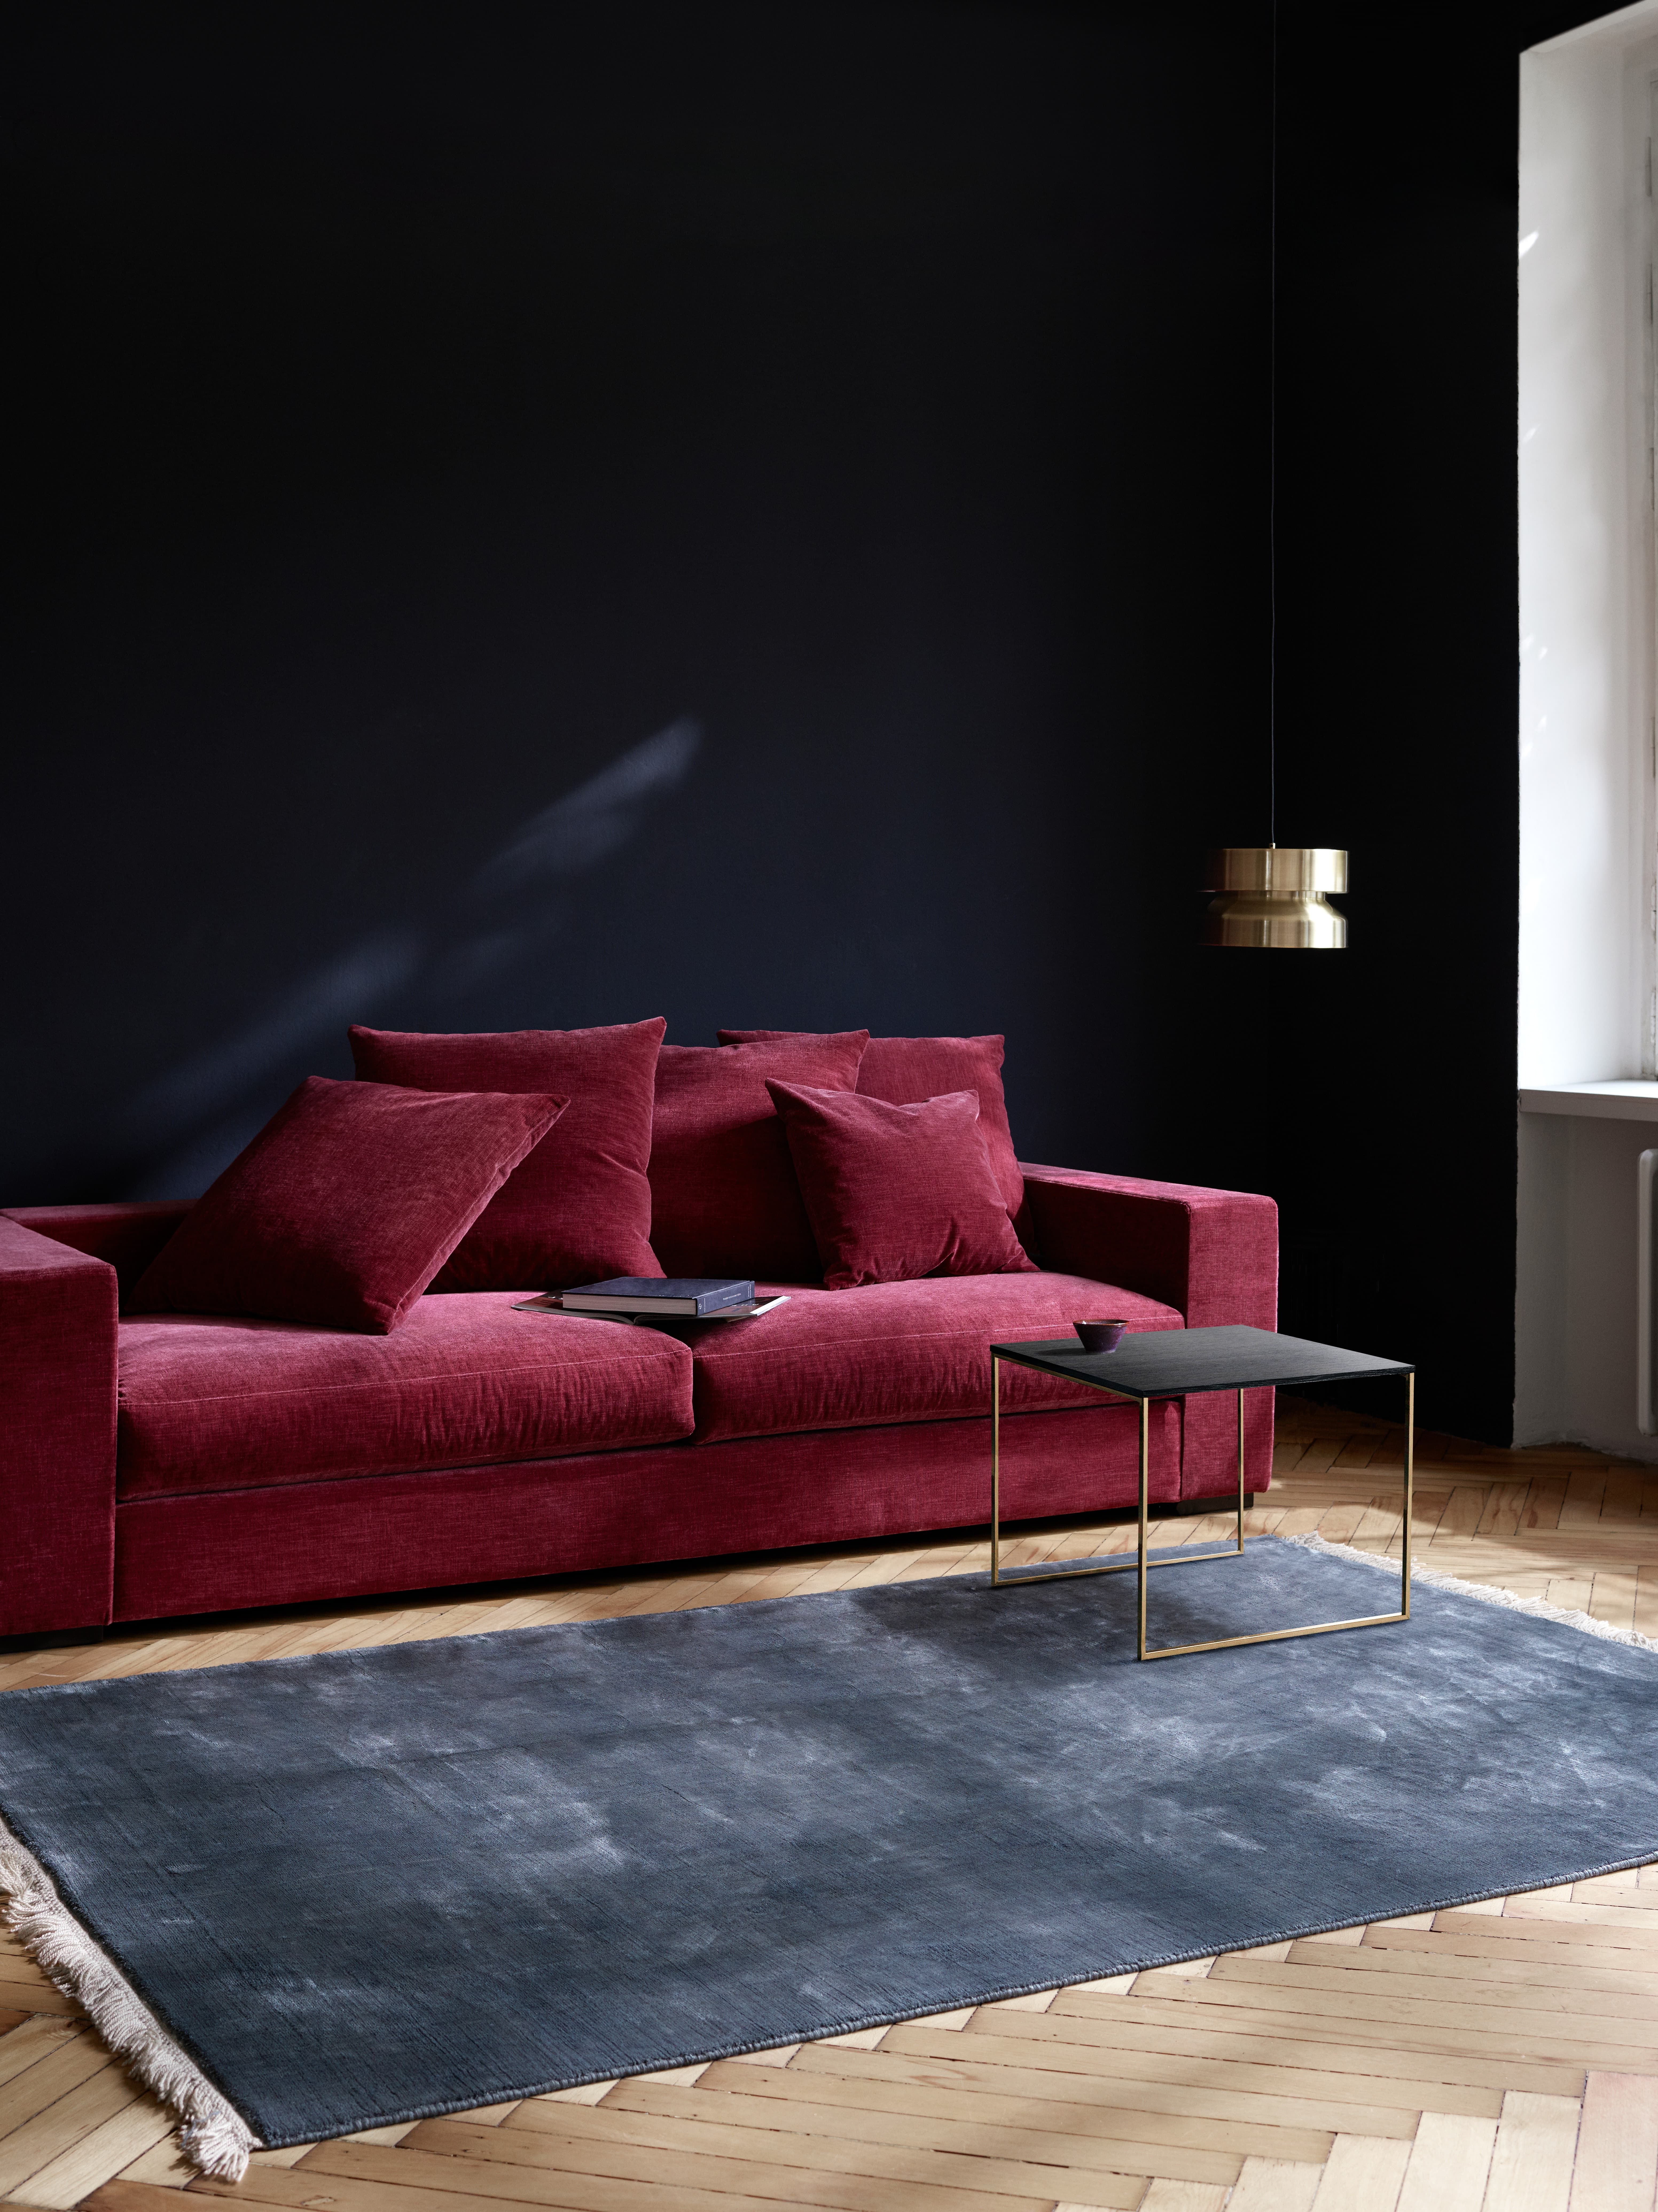 Sofas En Lugo J7do Cenova sofa Mit Lugo Couchtisch Boconcept Interiordesign